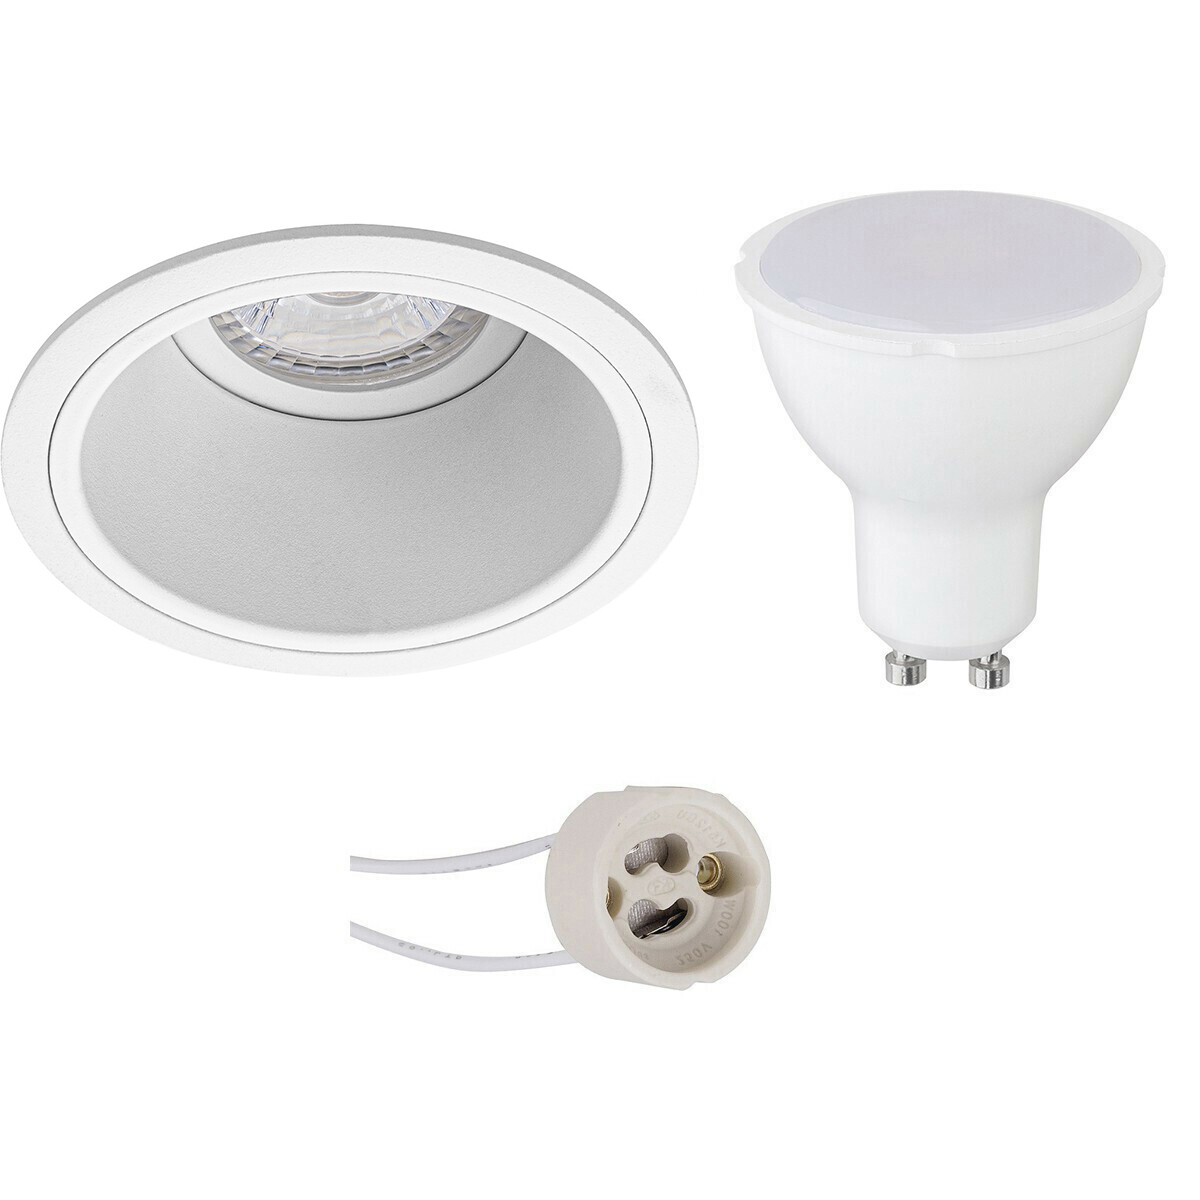 LED Spot Set - Pragmi Minko Pro - GU10 Fitting - Inbouw Rond - Mat Wit - 4W - Helder/Koud Wit 6400K